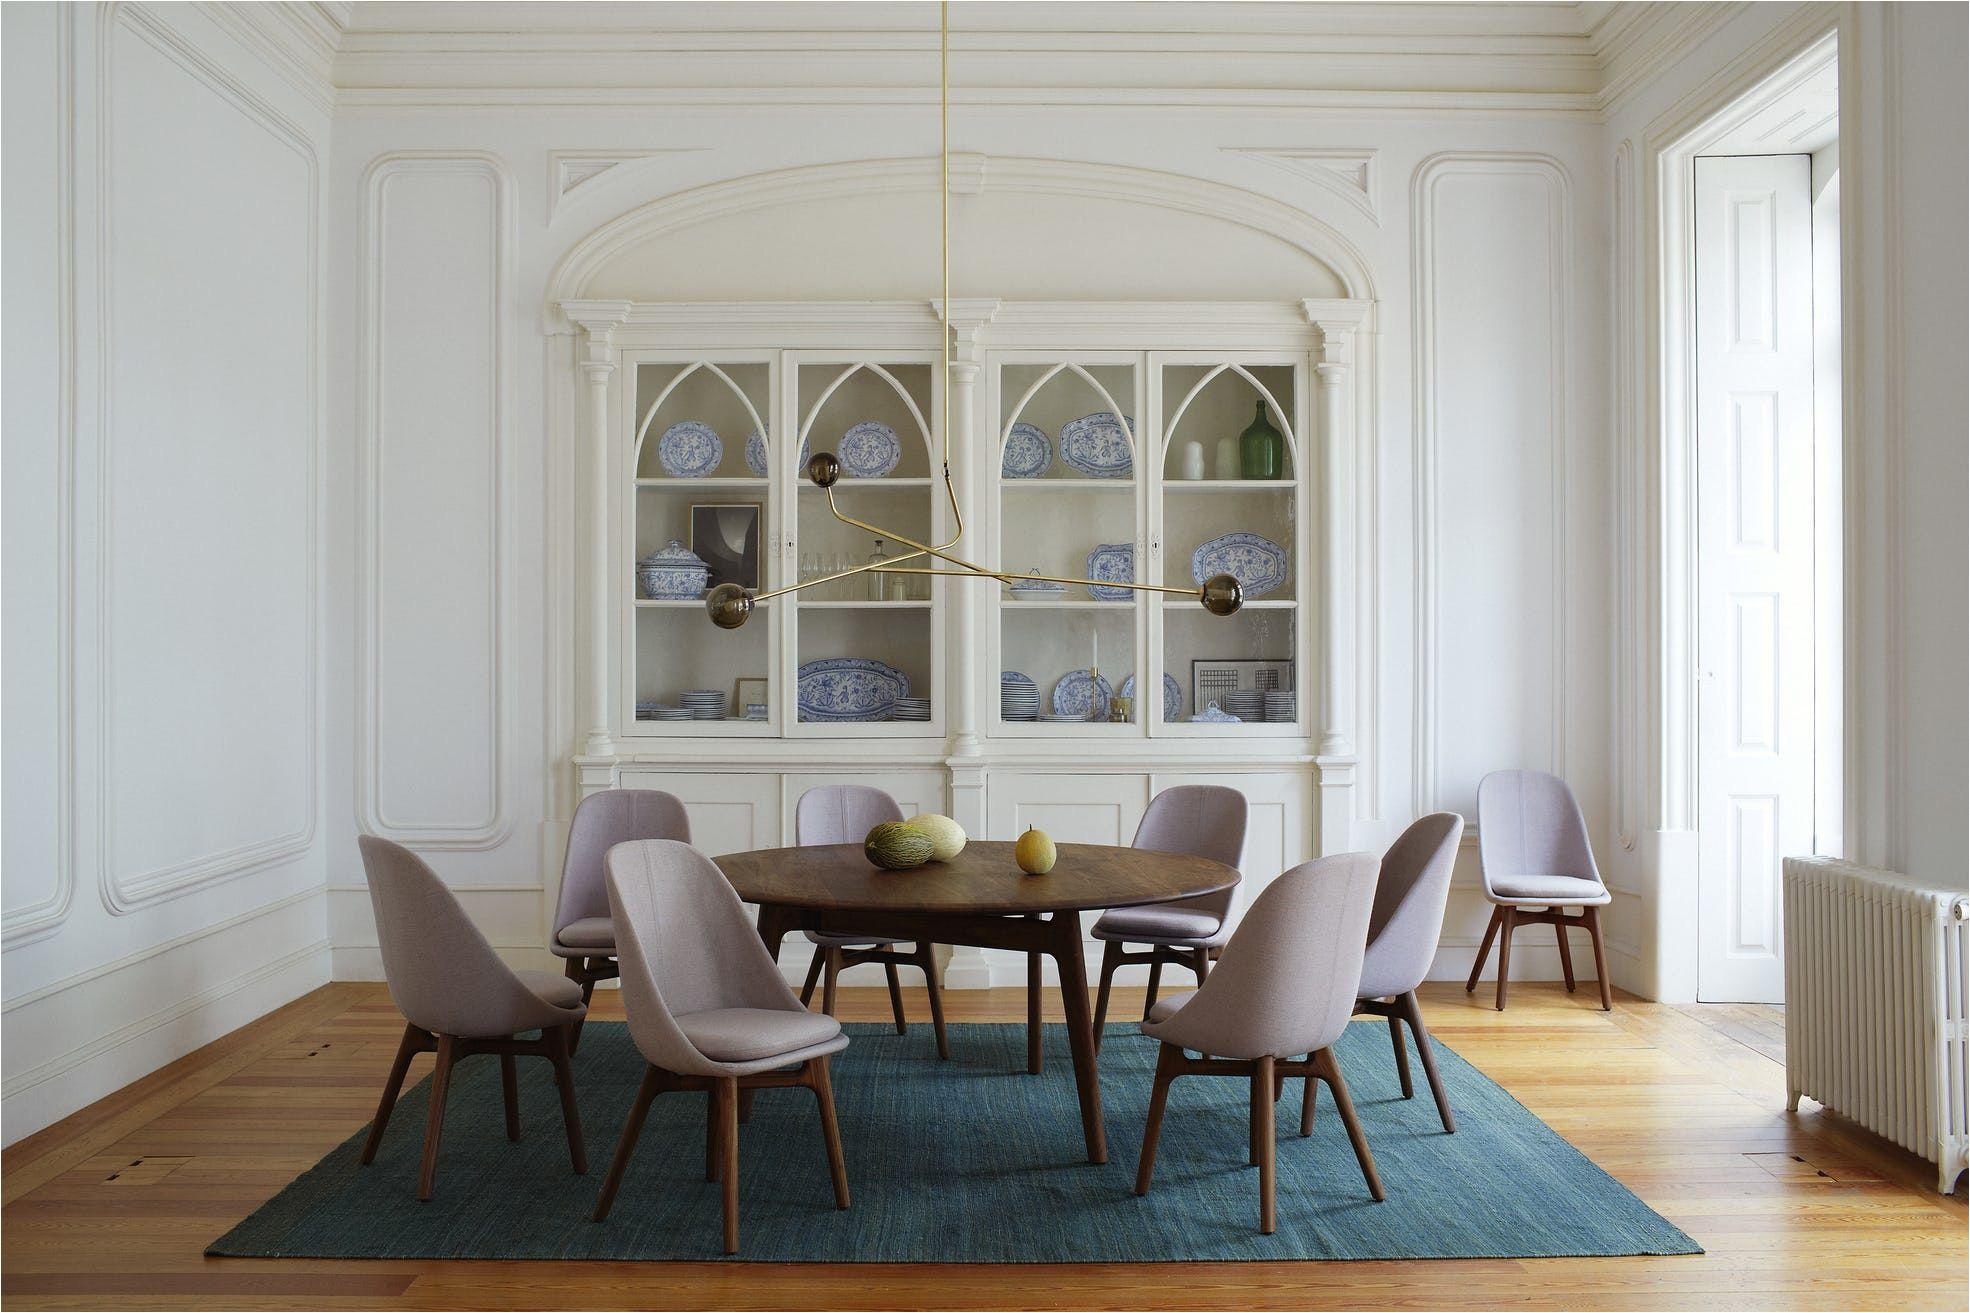 solo round table by de la espada now available at haute living